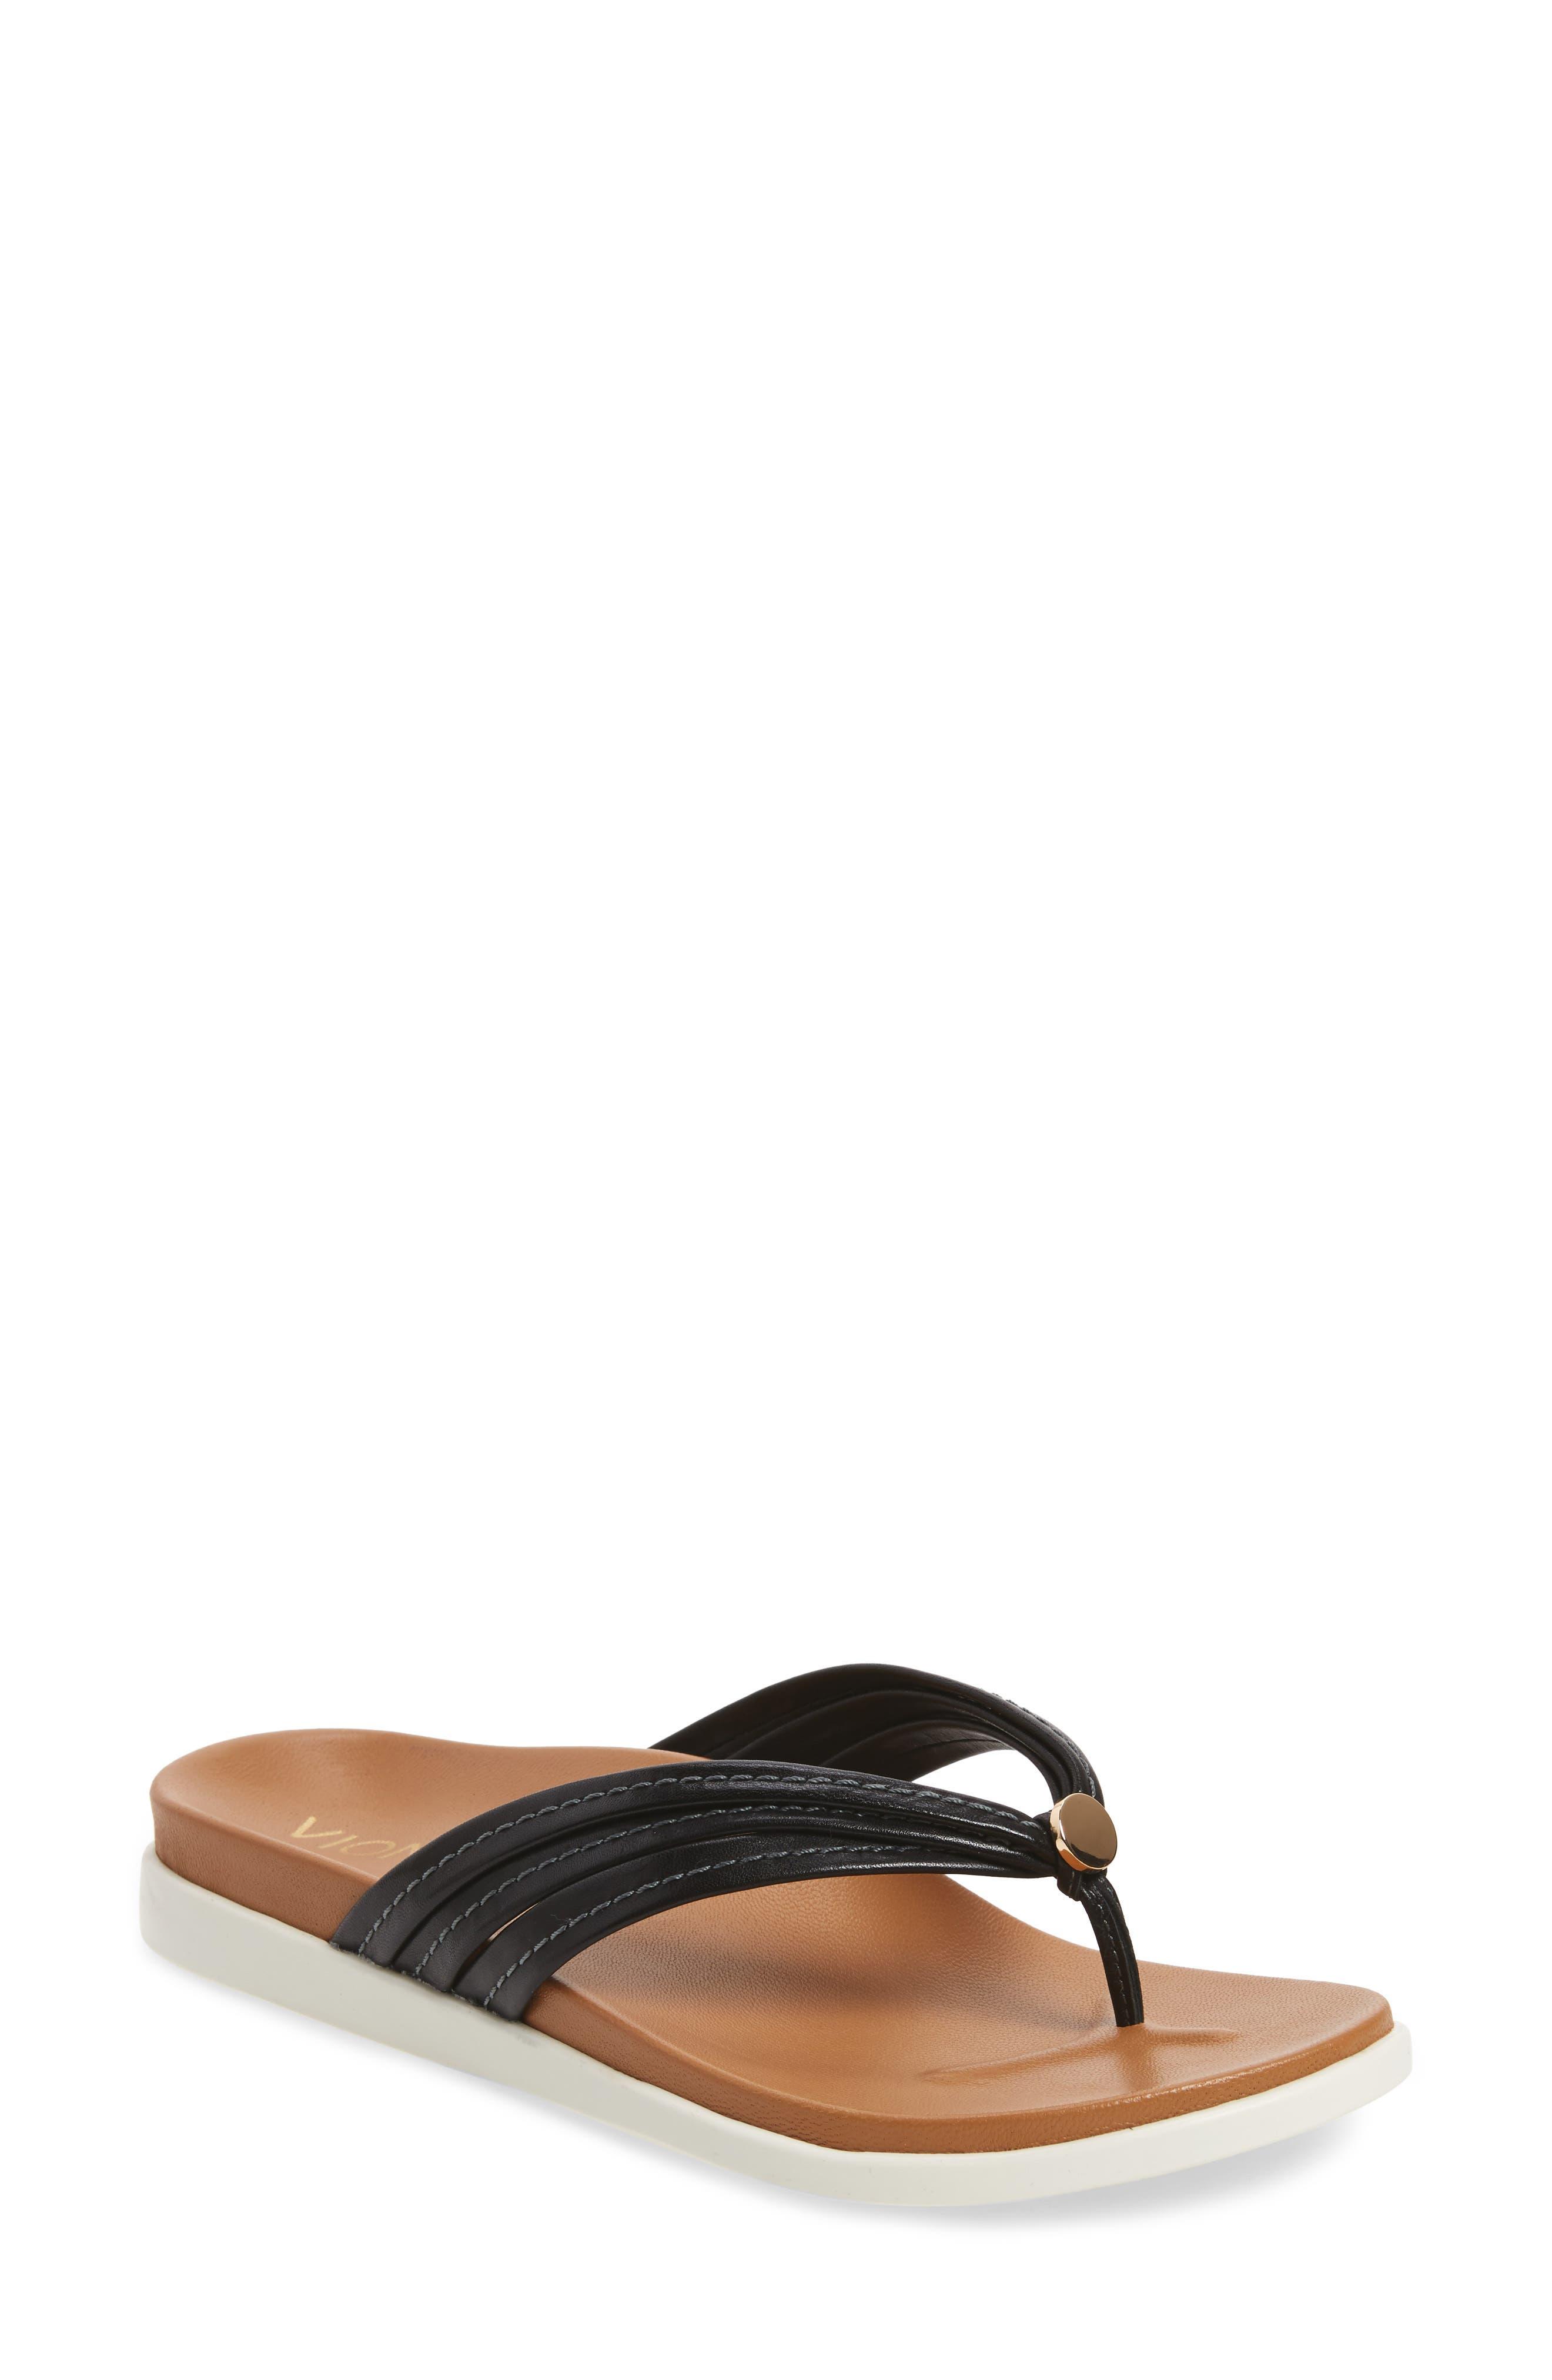 Catalina Flip Flop,                             Main thumbnail 1, color,                             Black Leather